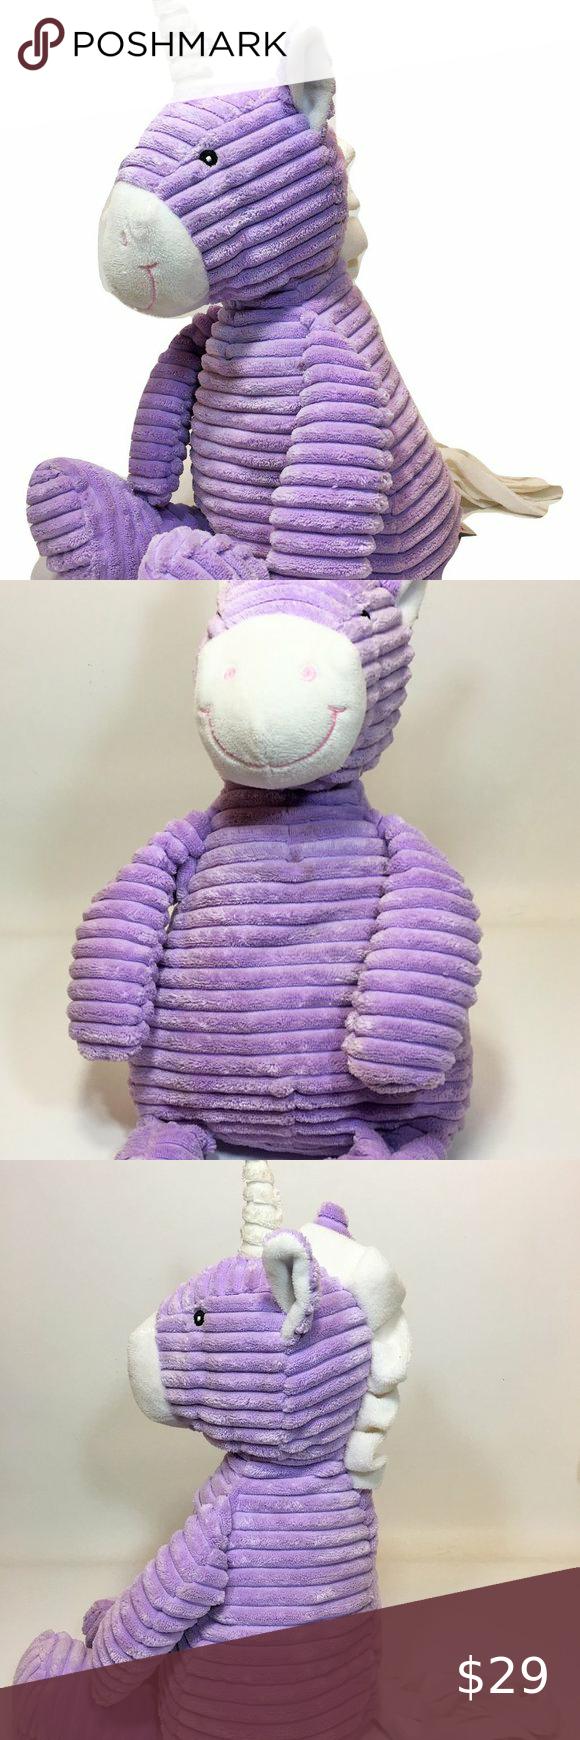 Teddy Bear Stuffed Toy, Pin On My Posh Closet